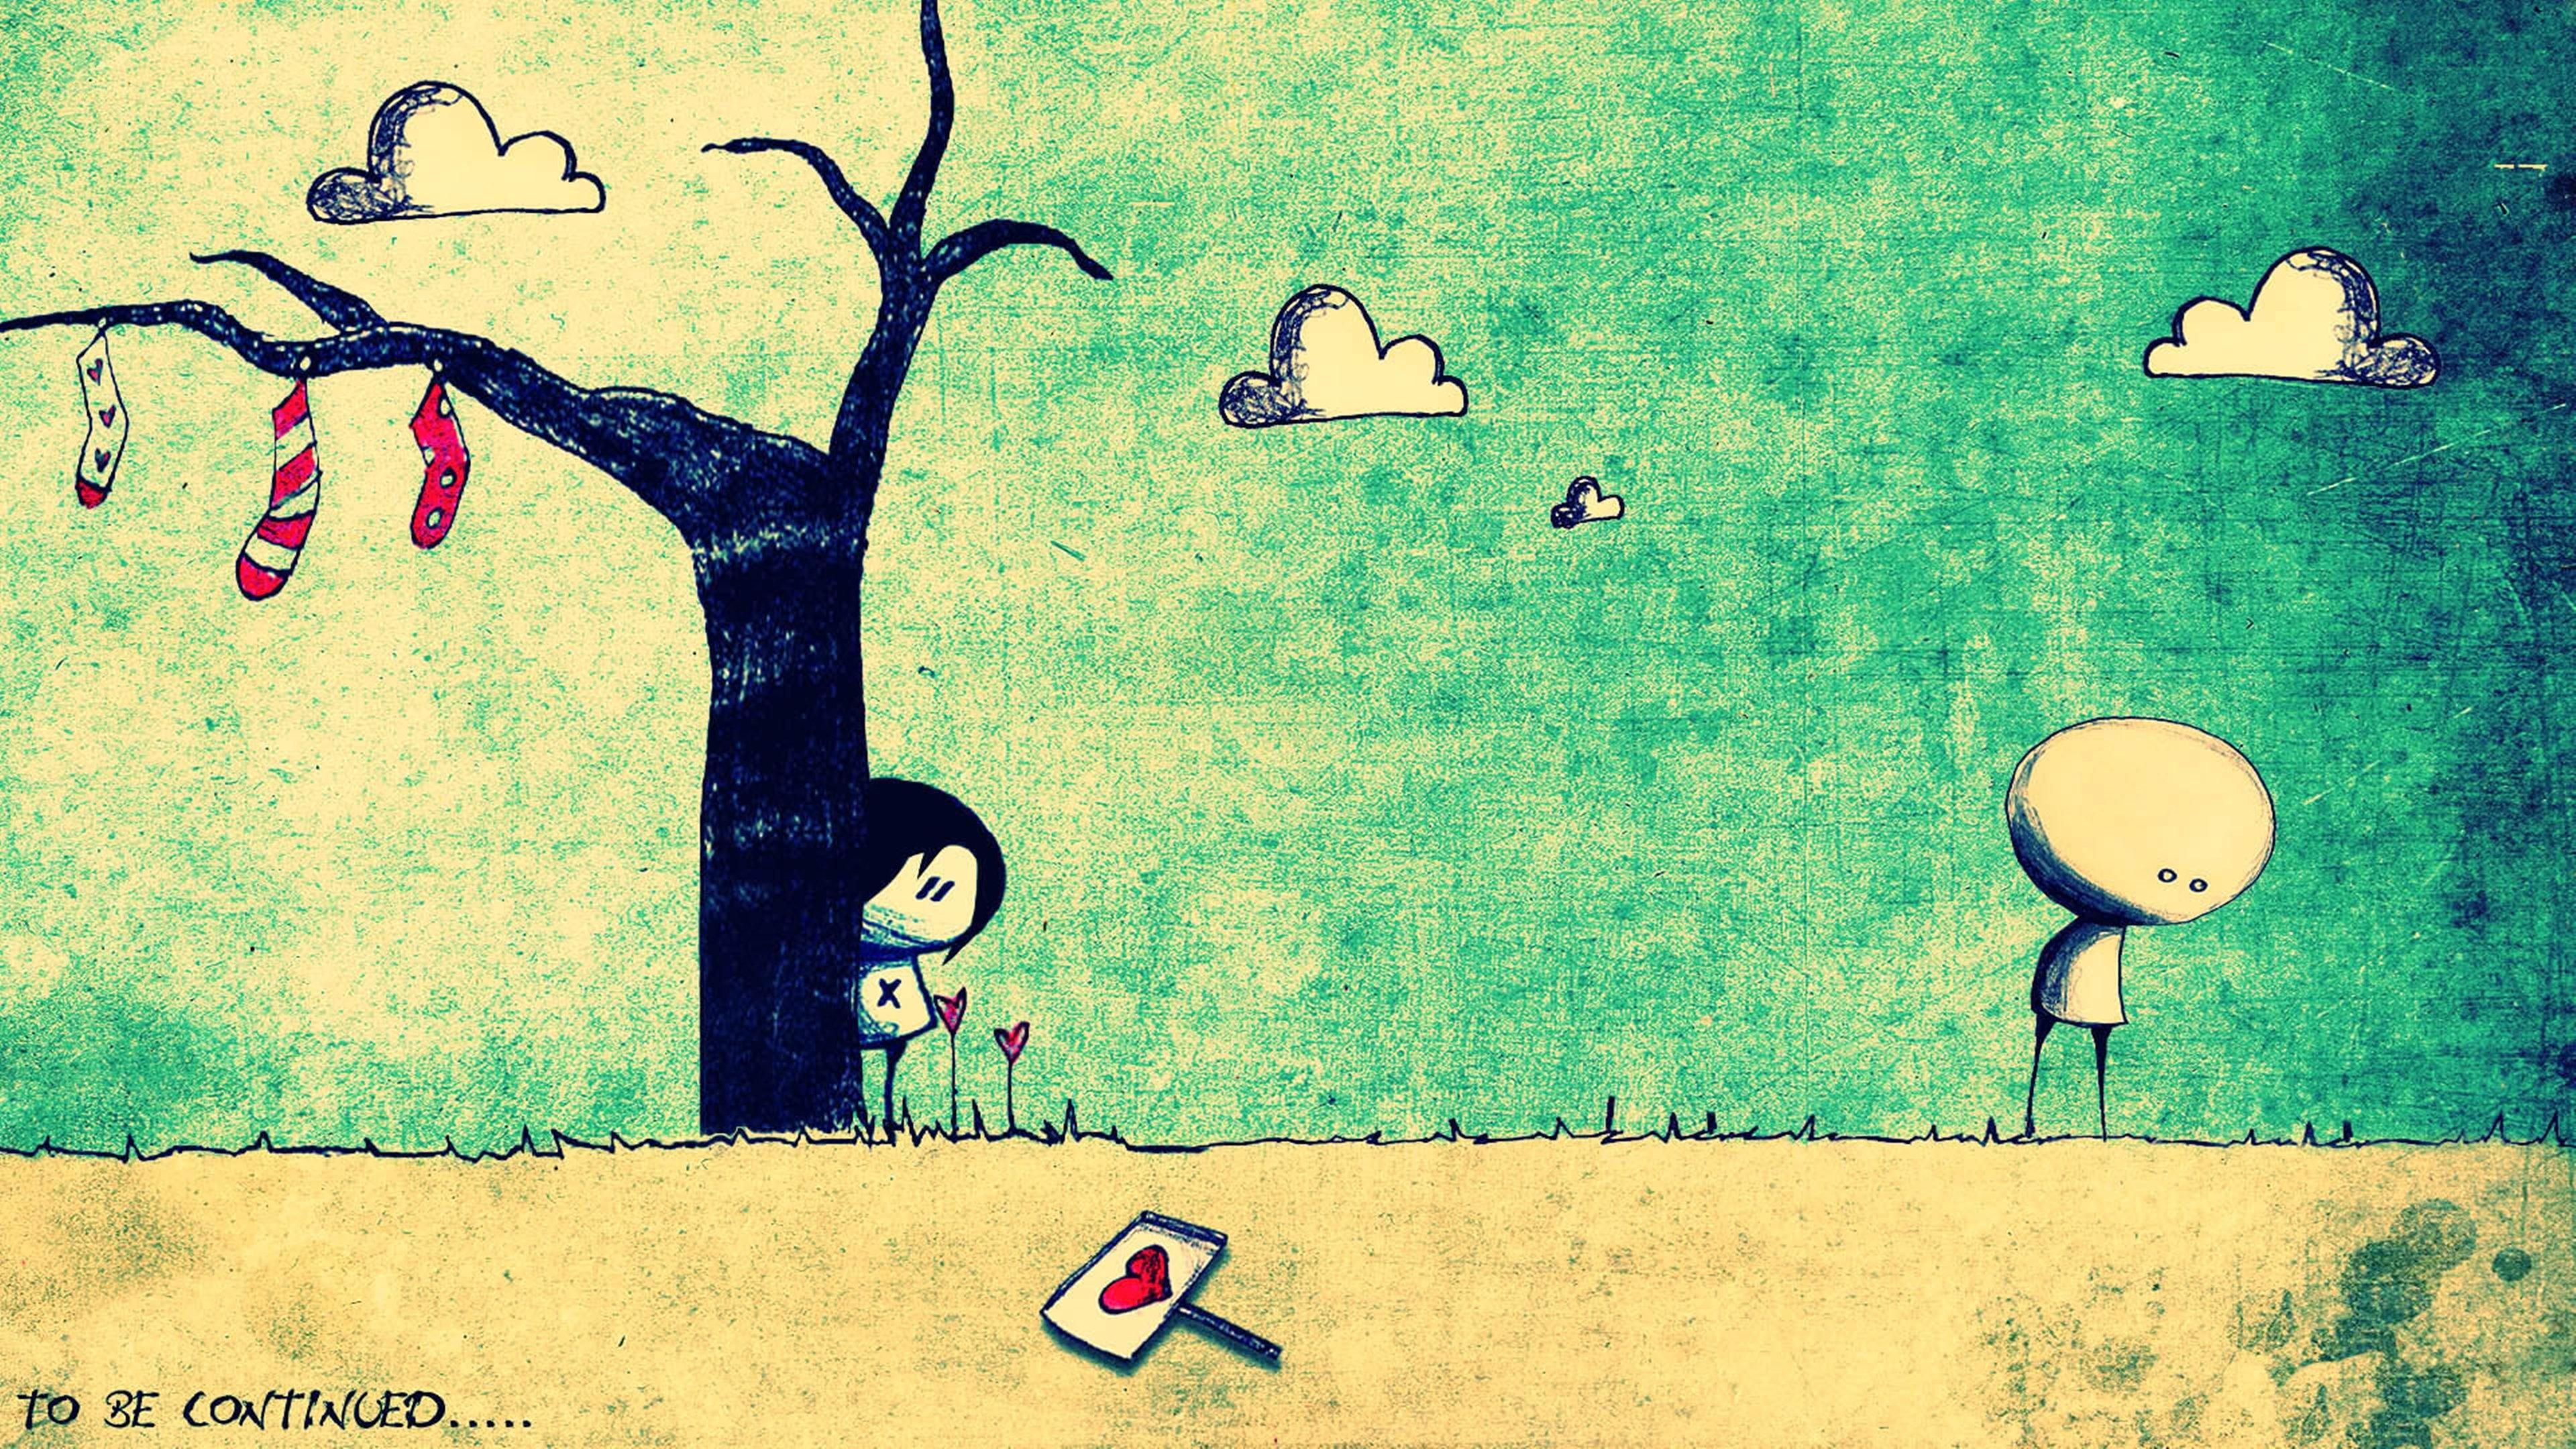 Drawing design story love sad art emotions lovers wallpaper 3840x2160 662832 WallpaperUP